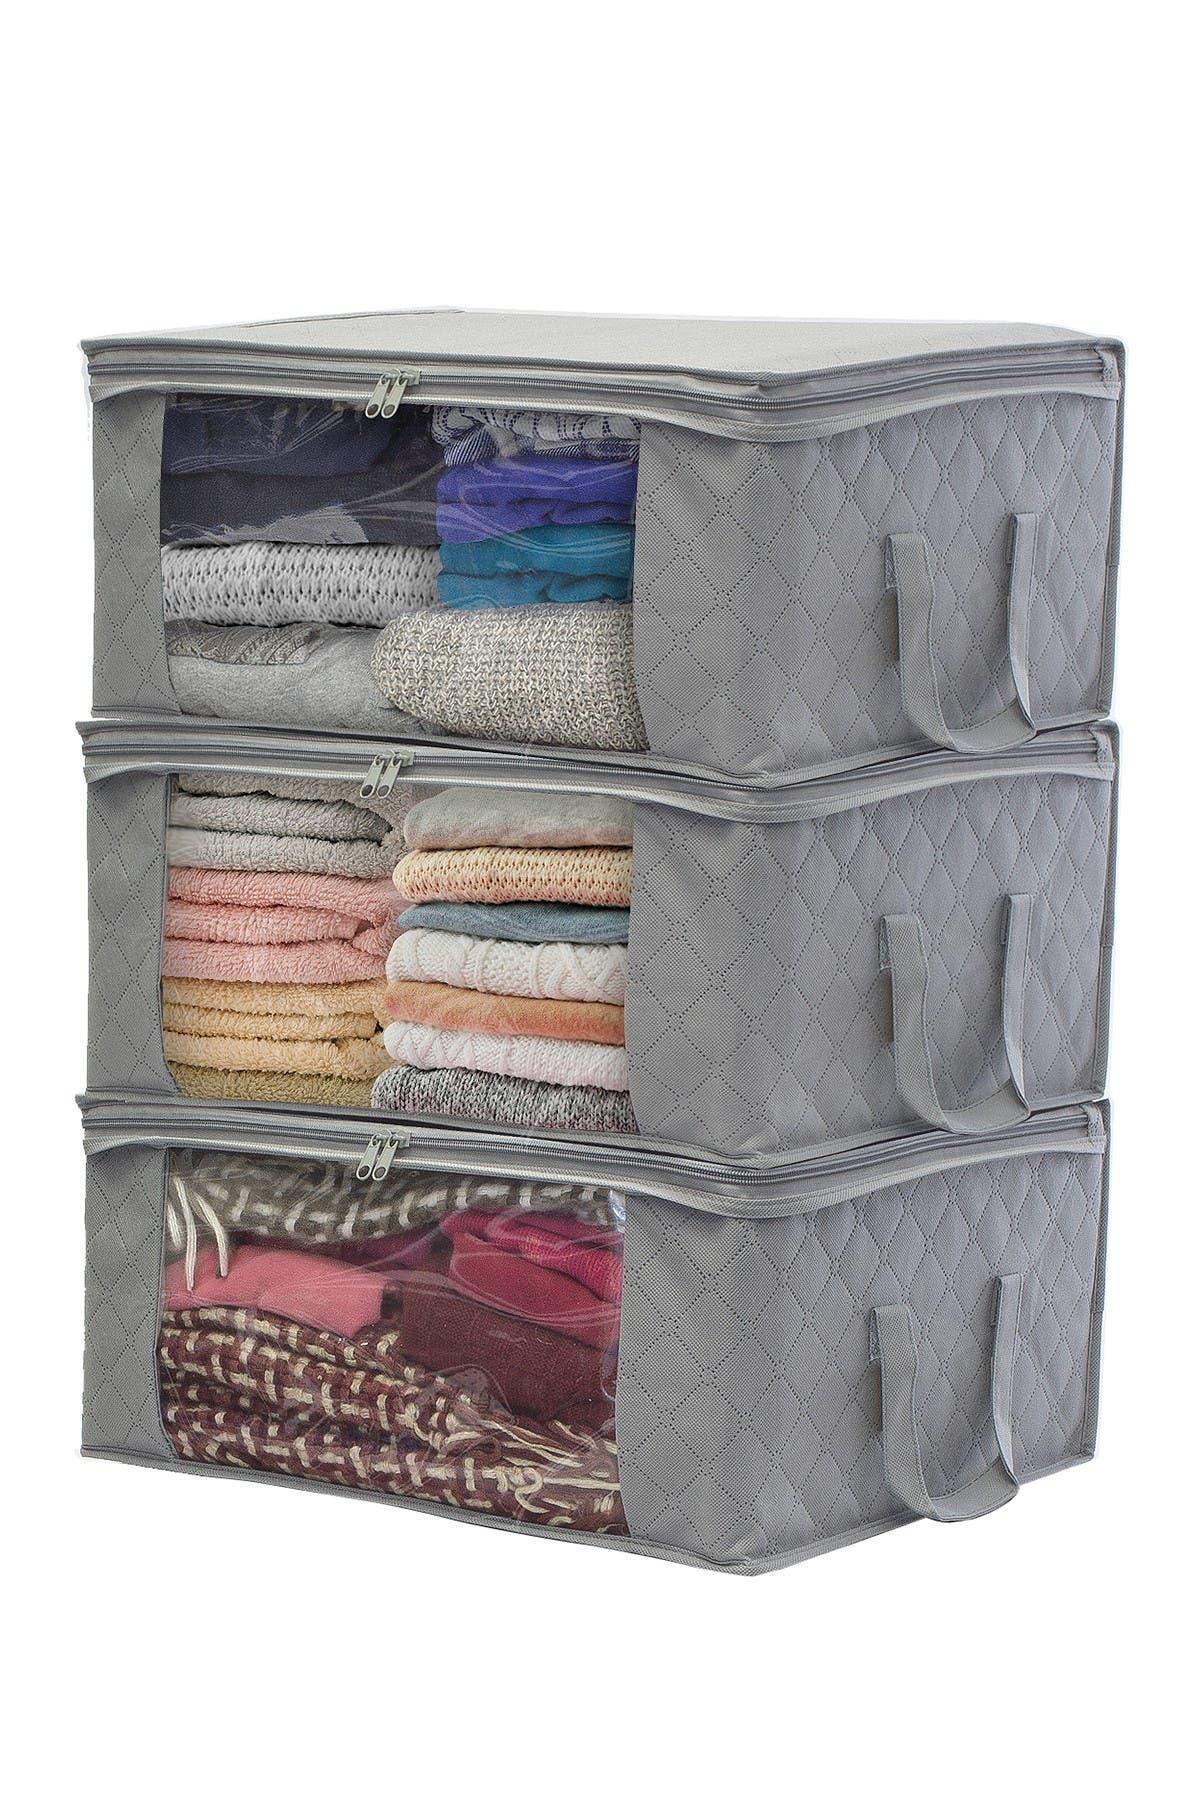 Image of Sorbus Foldable Fabric Storage Organizer Bag - Set of 3 - Grey